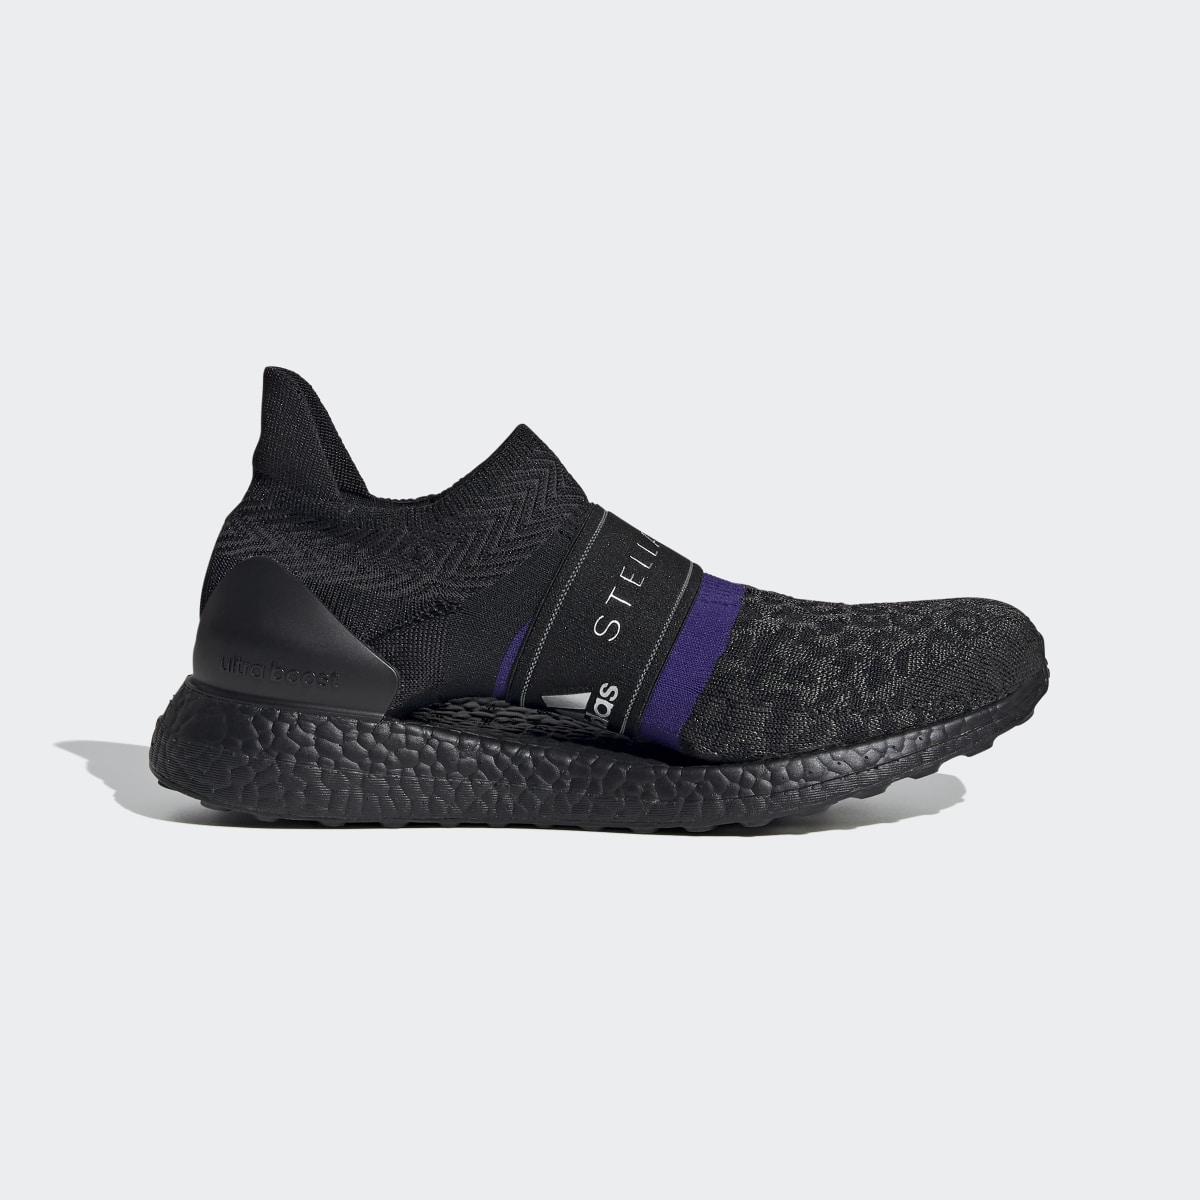 adidas by Stella McCartney Ultraboost X 3D Knit Shoes